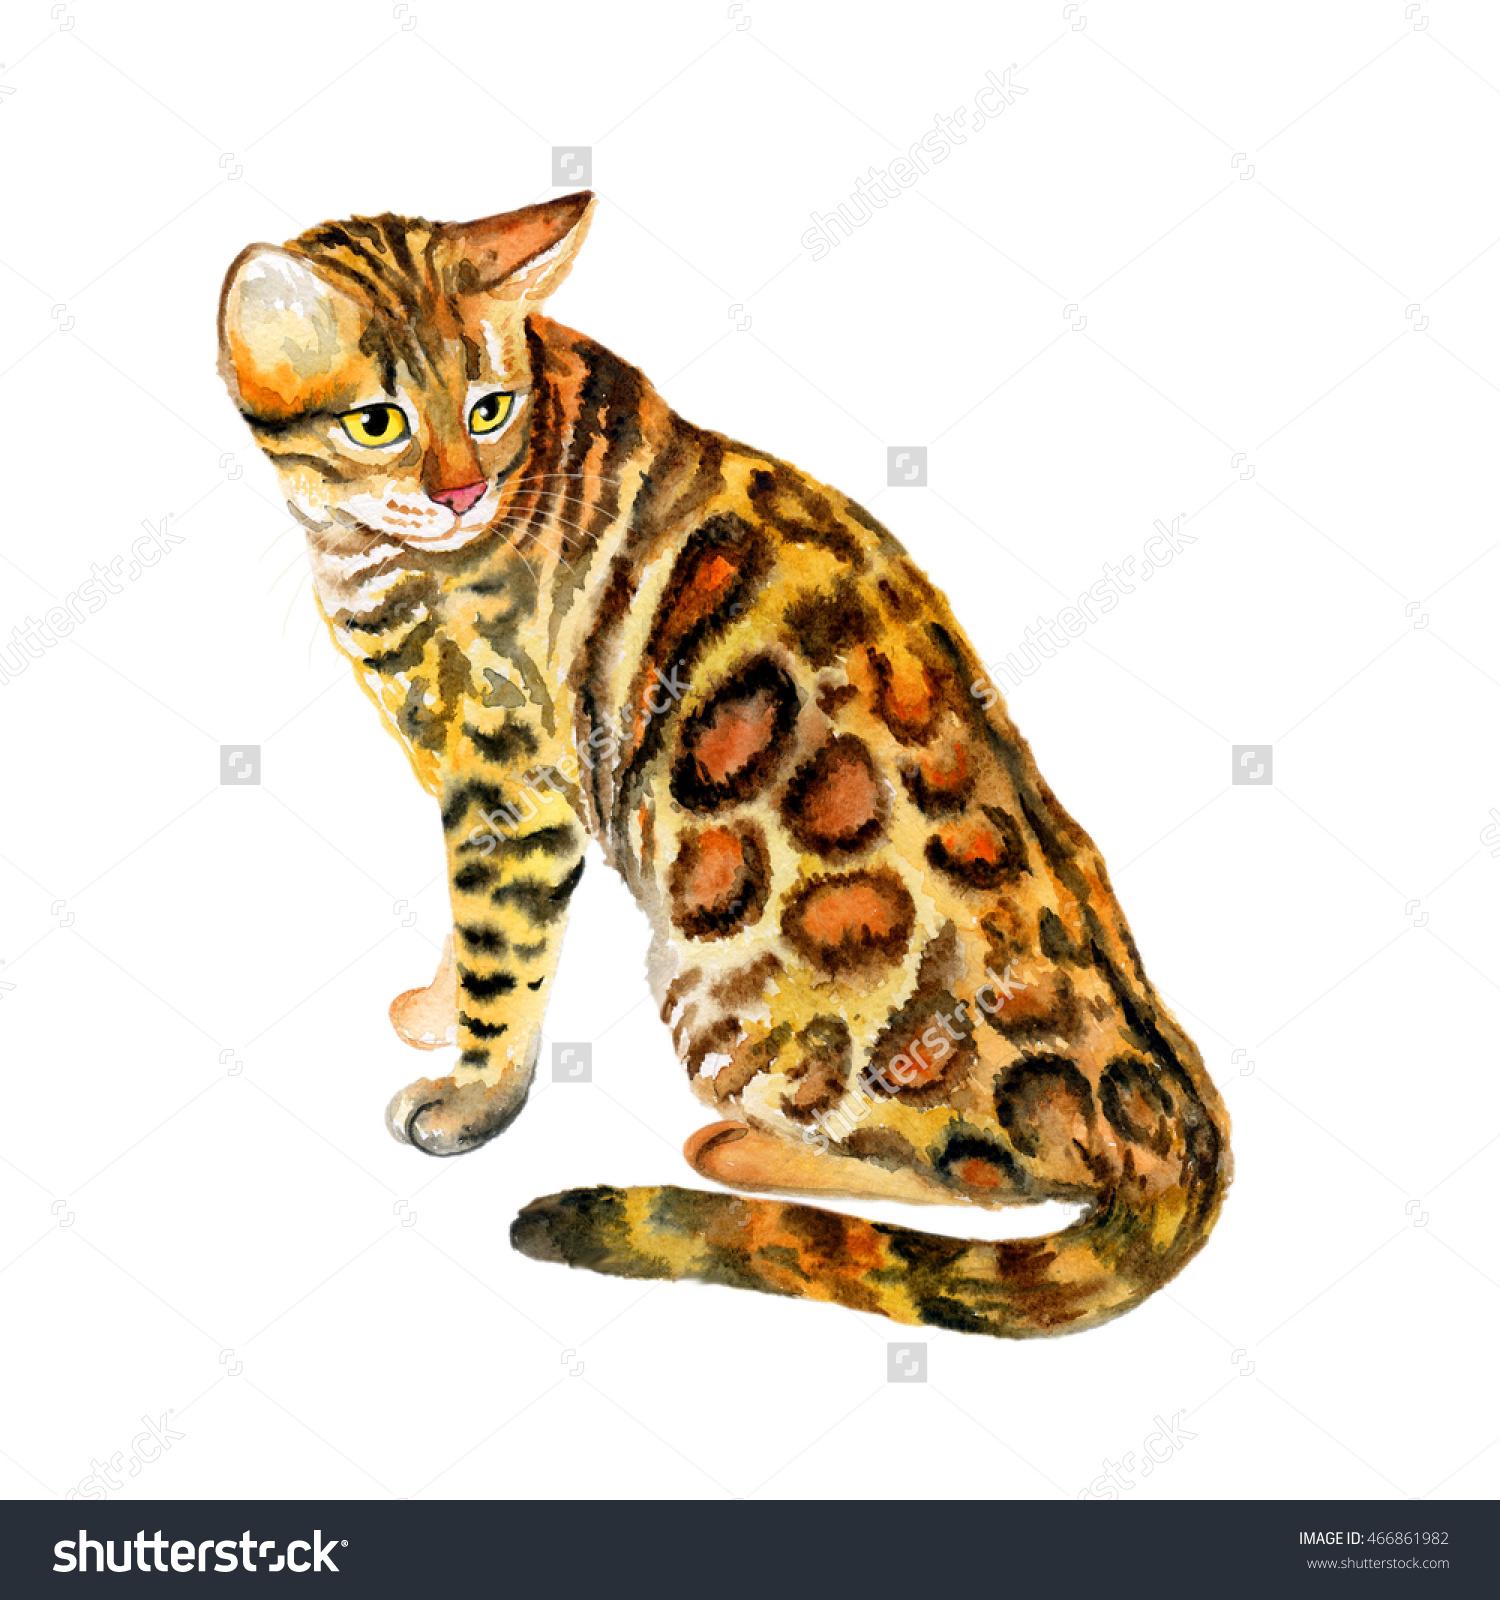 Bengal Cat clipart #19, Download drawings